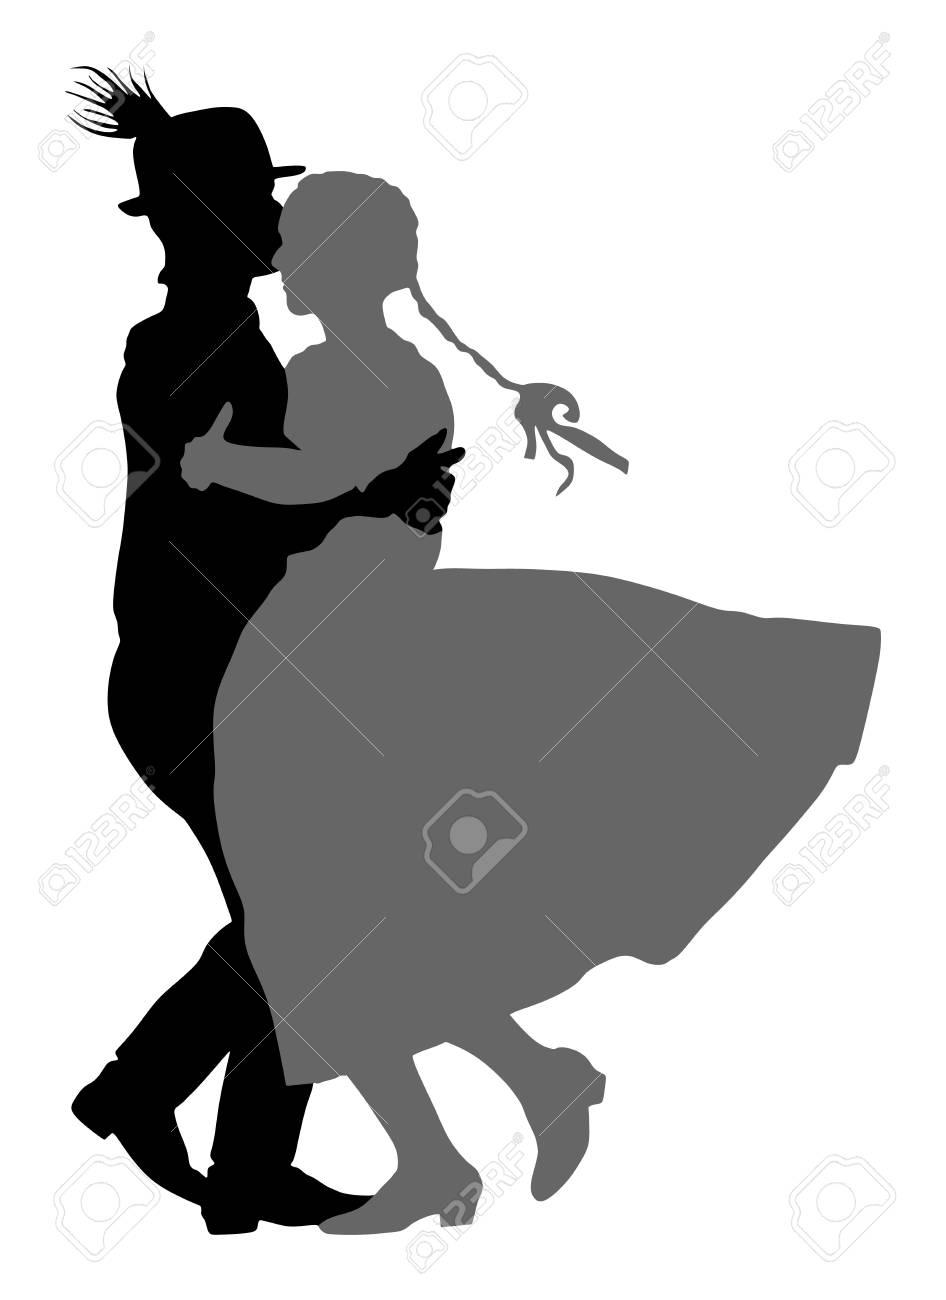 Hungarian folk dancers couple vector. Germany folk dancers couple. Austrian folk dancers couple. East Europe folklore. Couple in love dancing Balkan folk. - 89179202